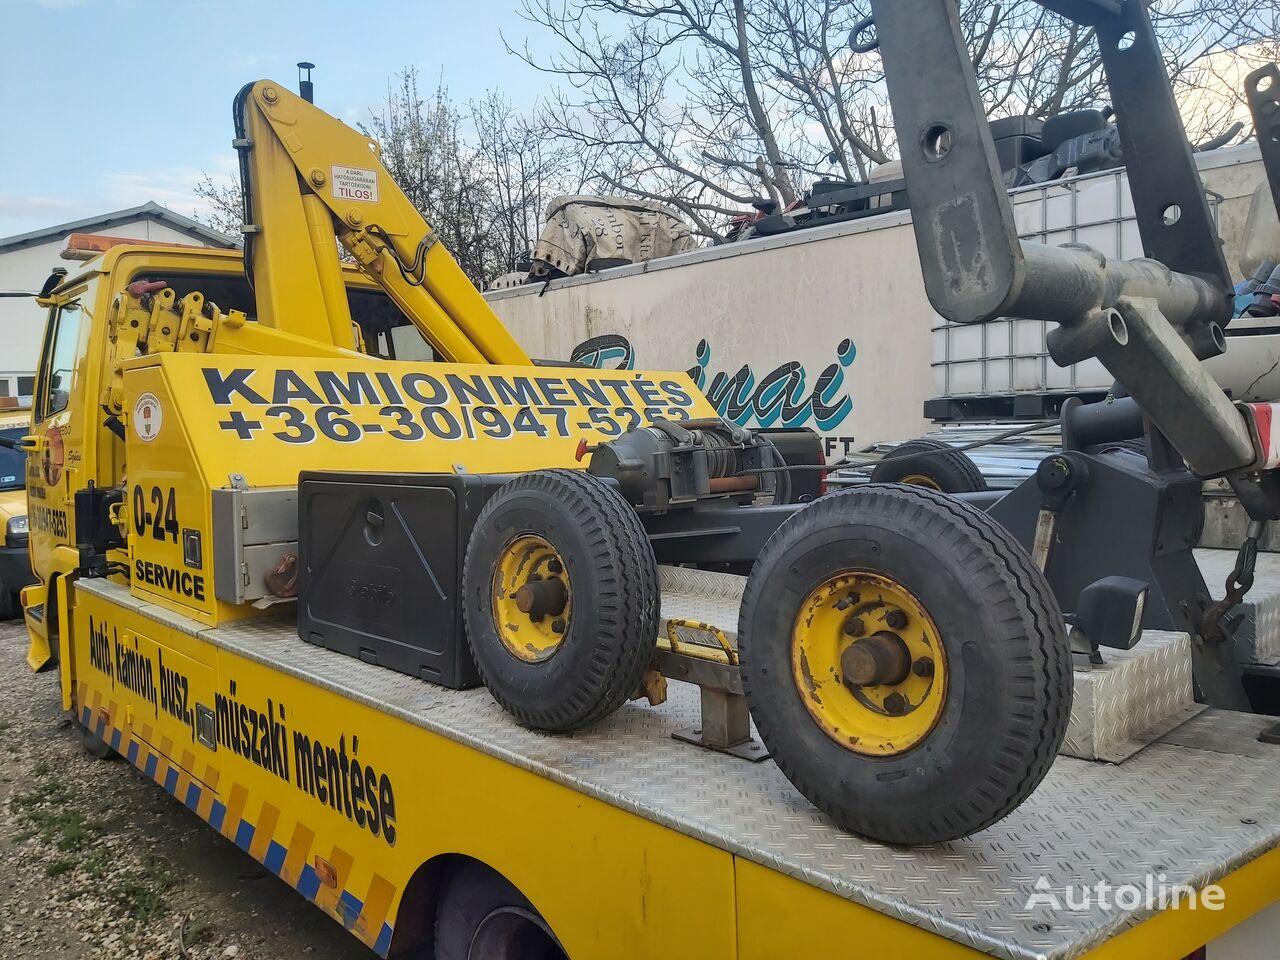 DAF FA 45 tow truck